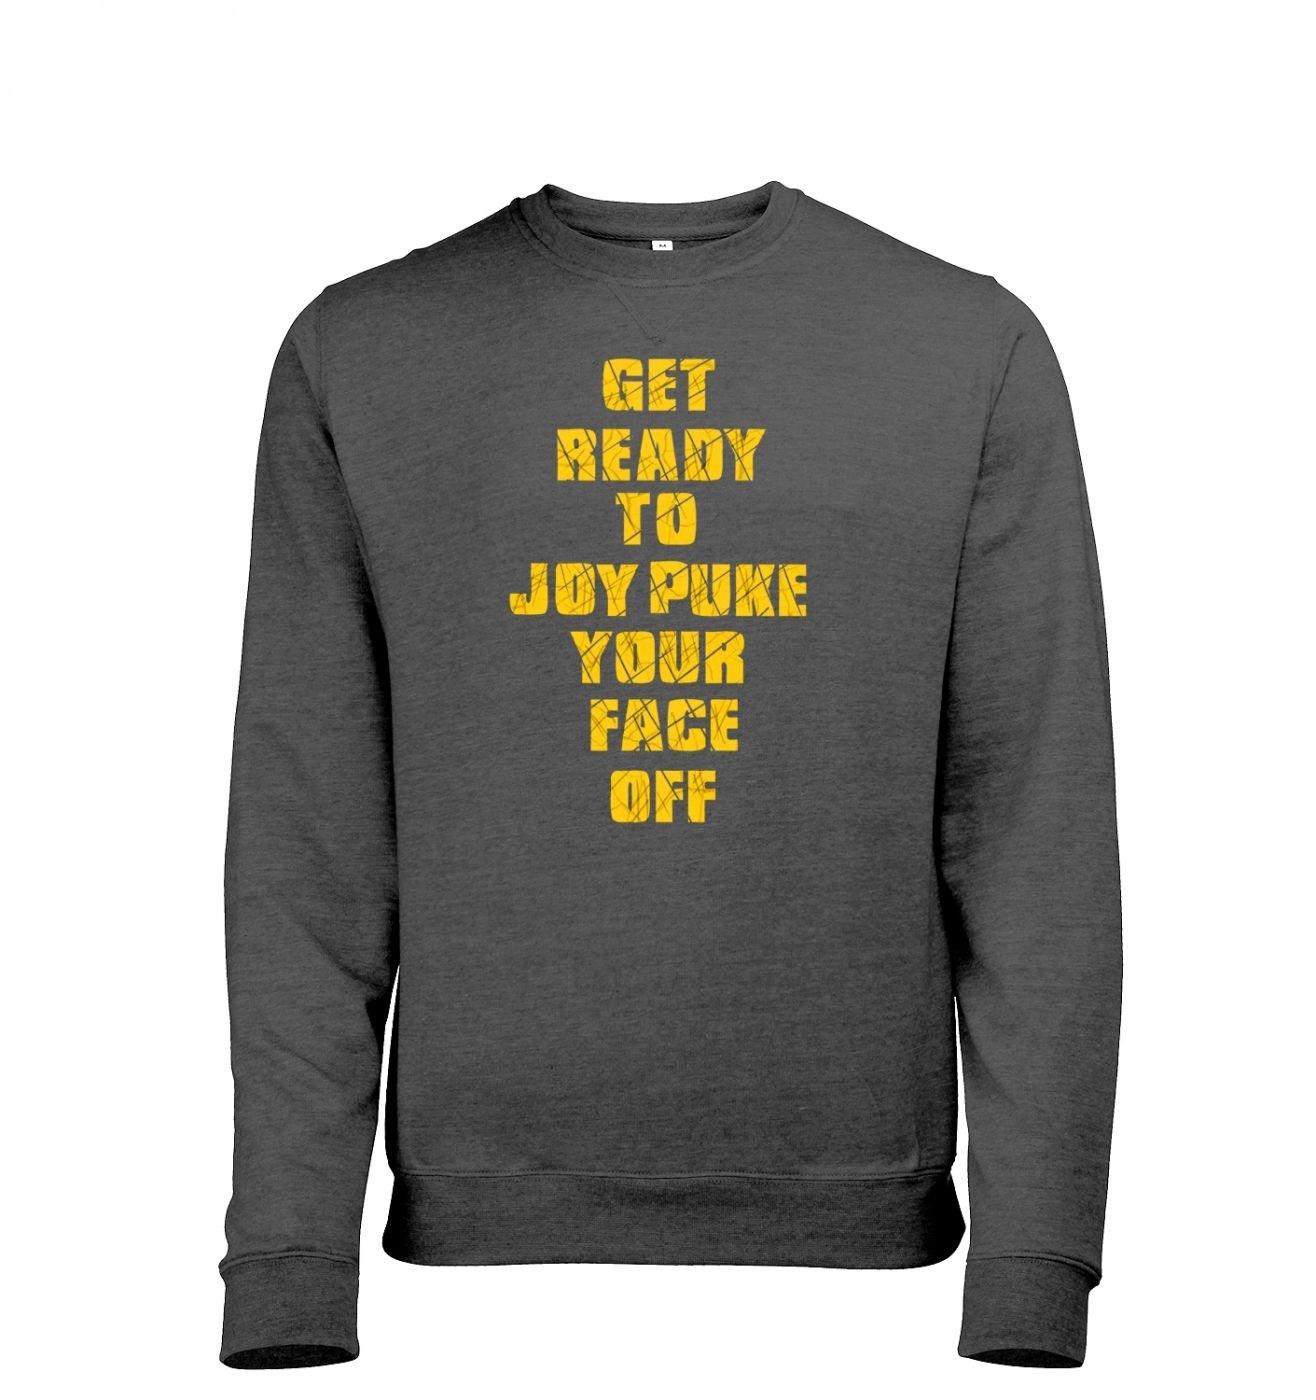 Get Ready To Joy Puke Your Face Off men's heather sweatshirt